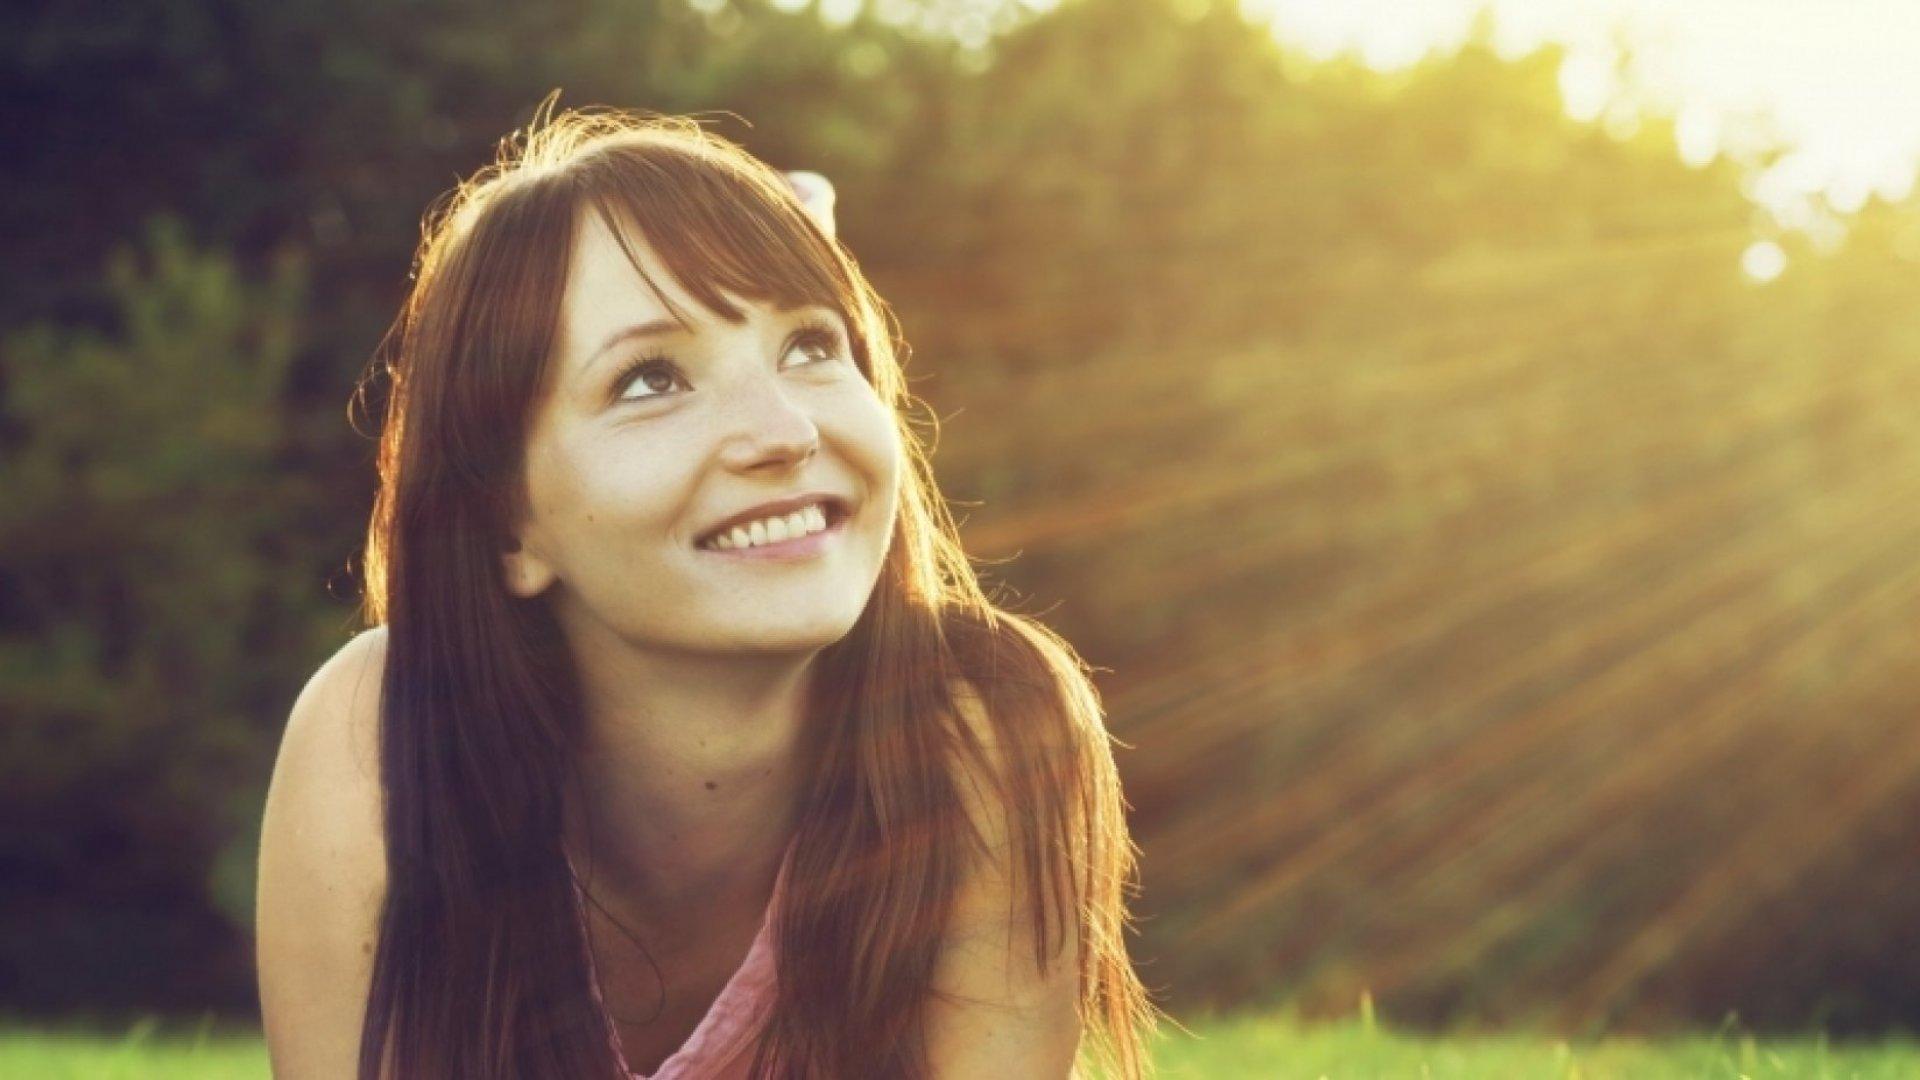 10 Inspiring Beliefs of Phenomenally Successful People